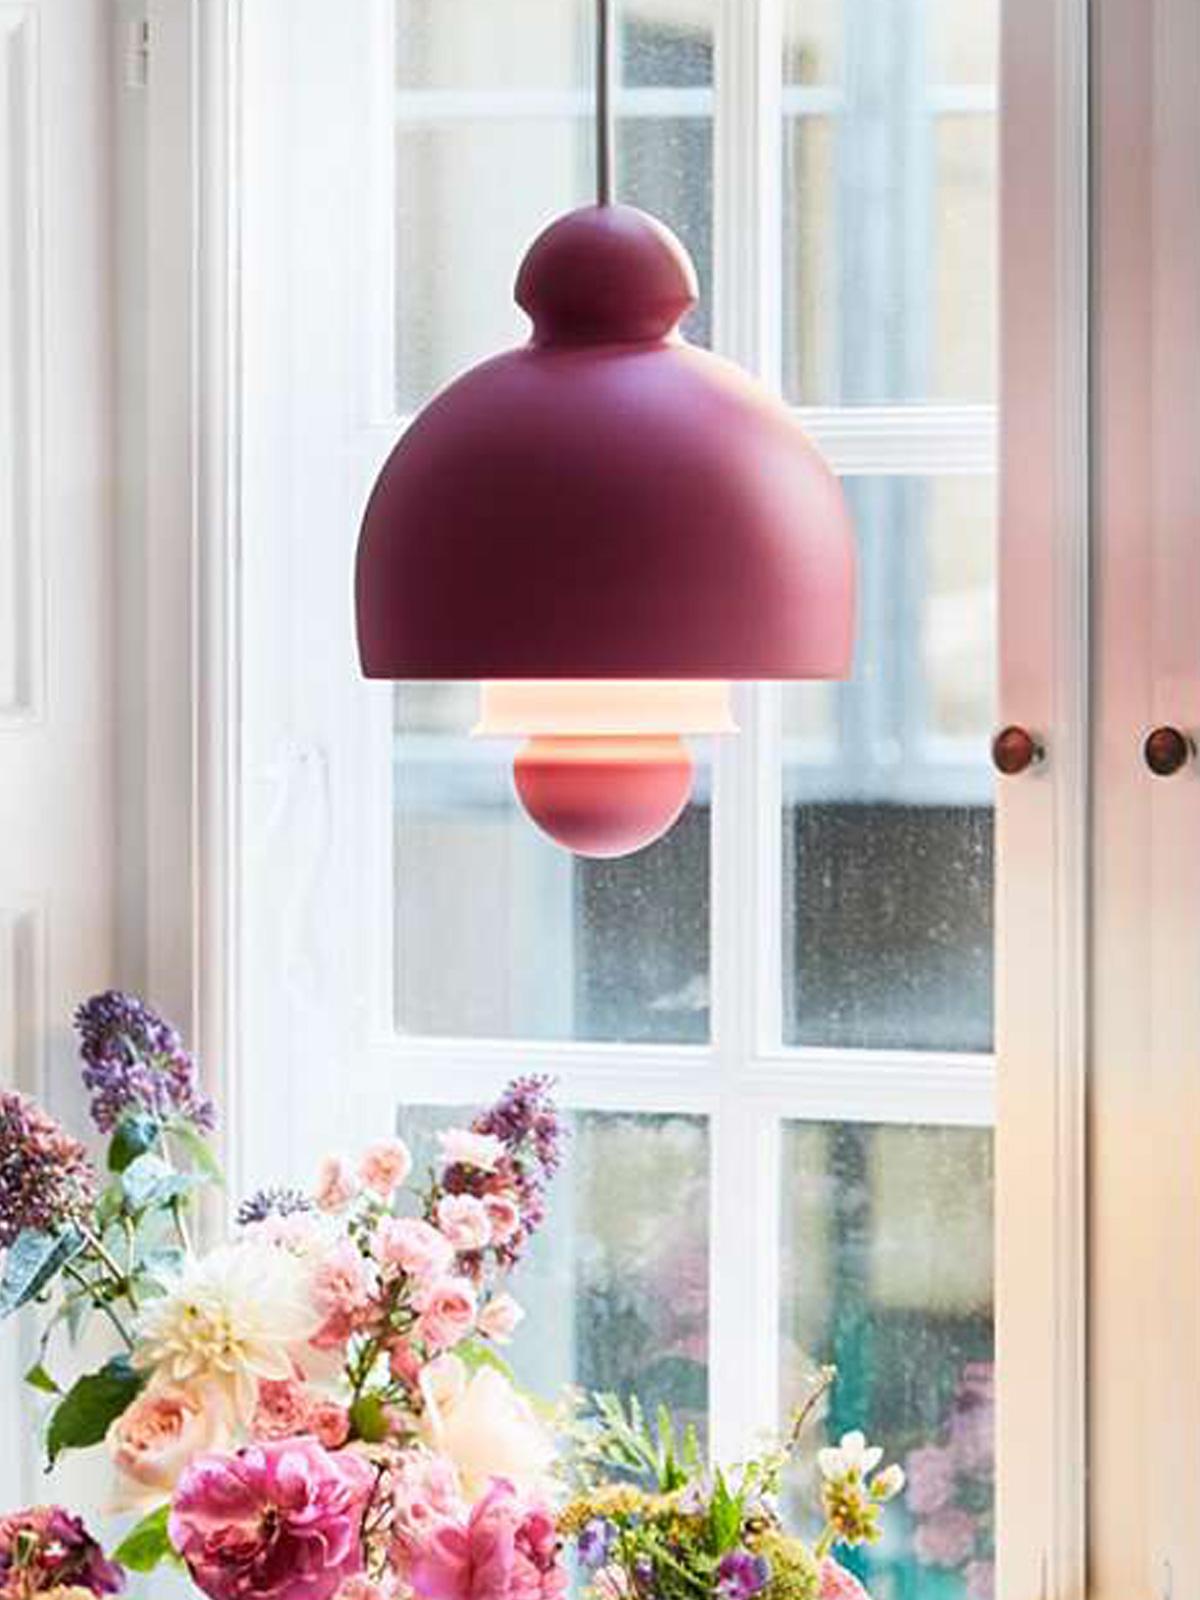 DesignOrt Blog: Designerleuchten in Rot Le Klint Antoni Lamp